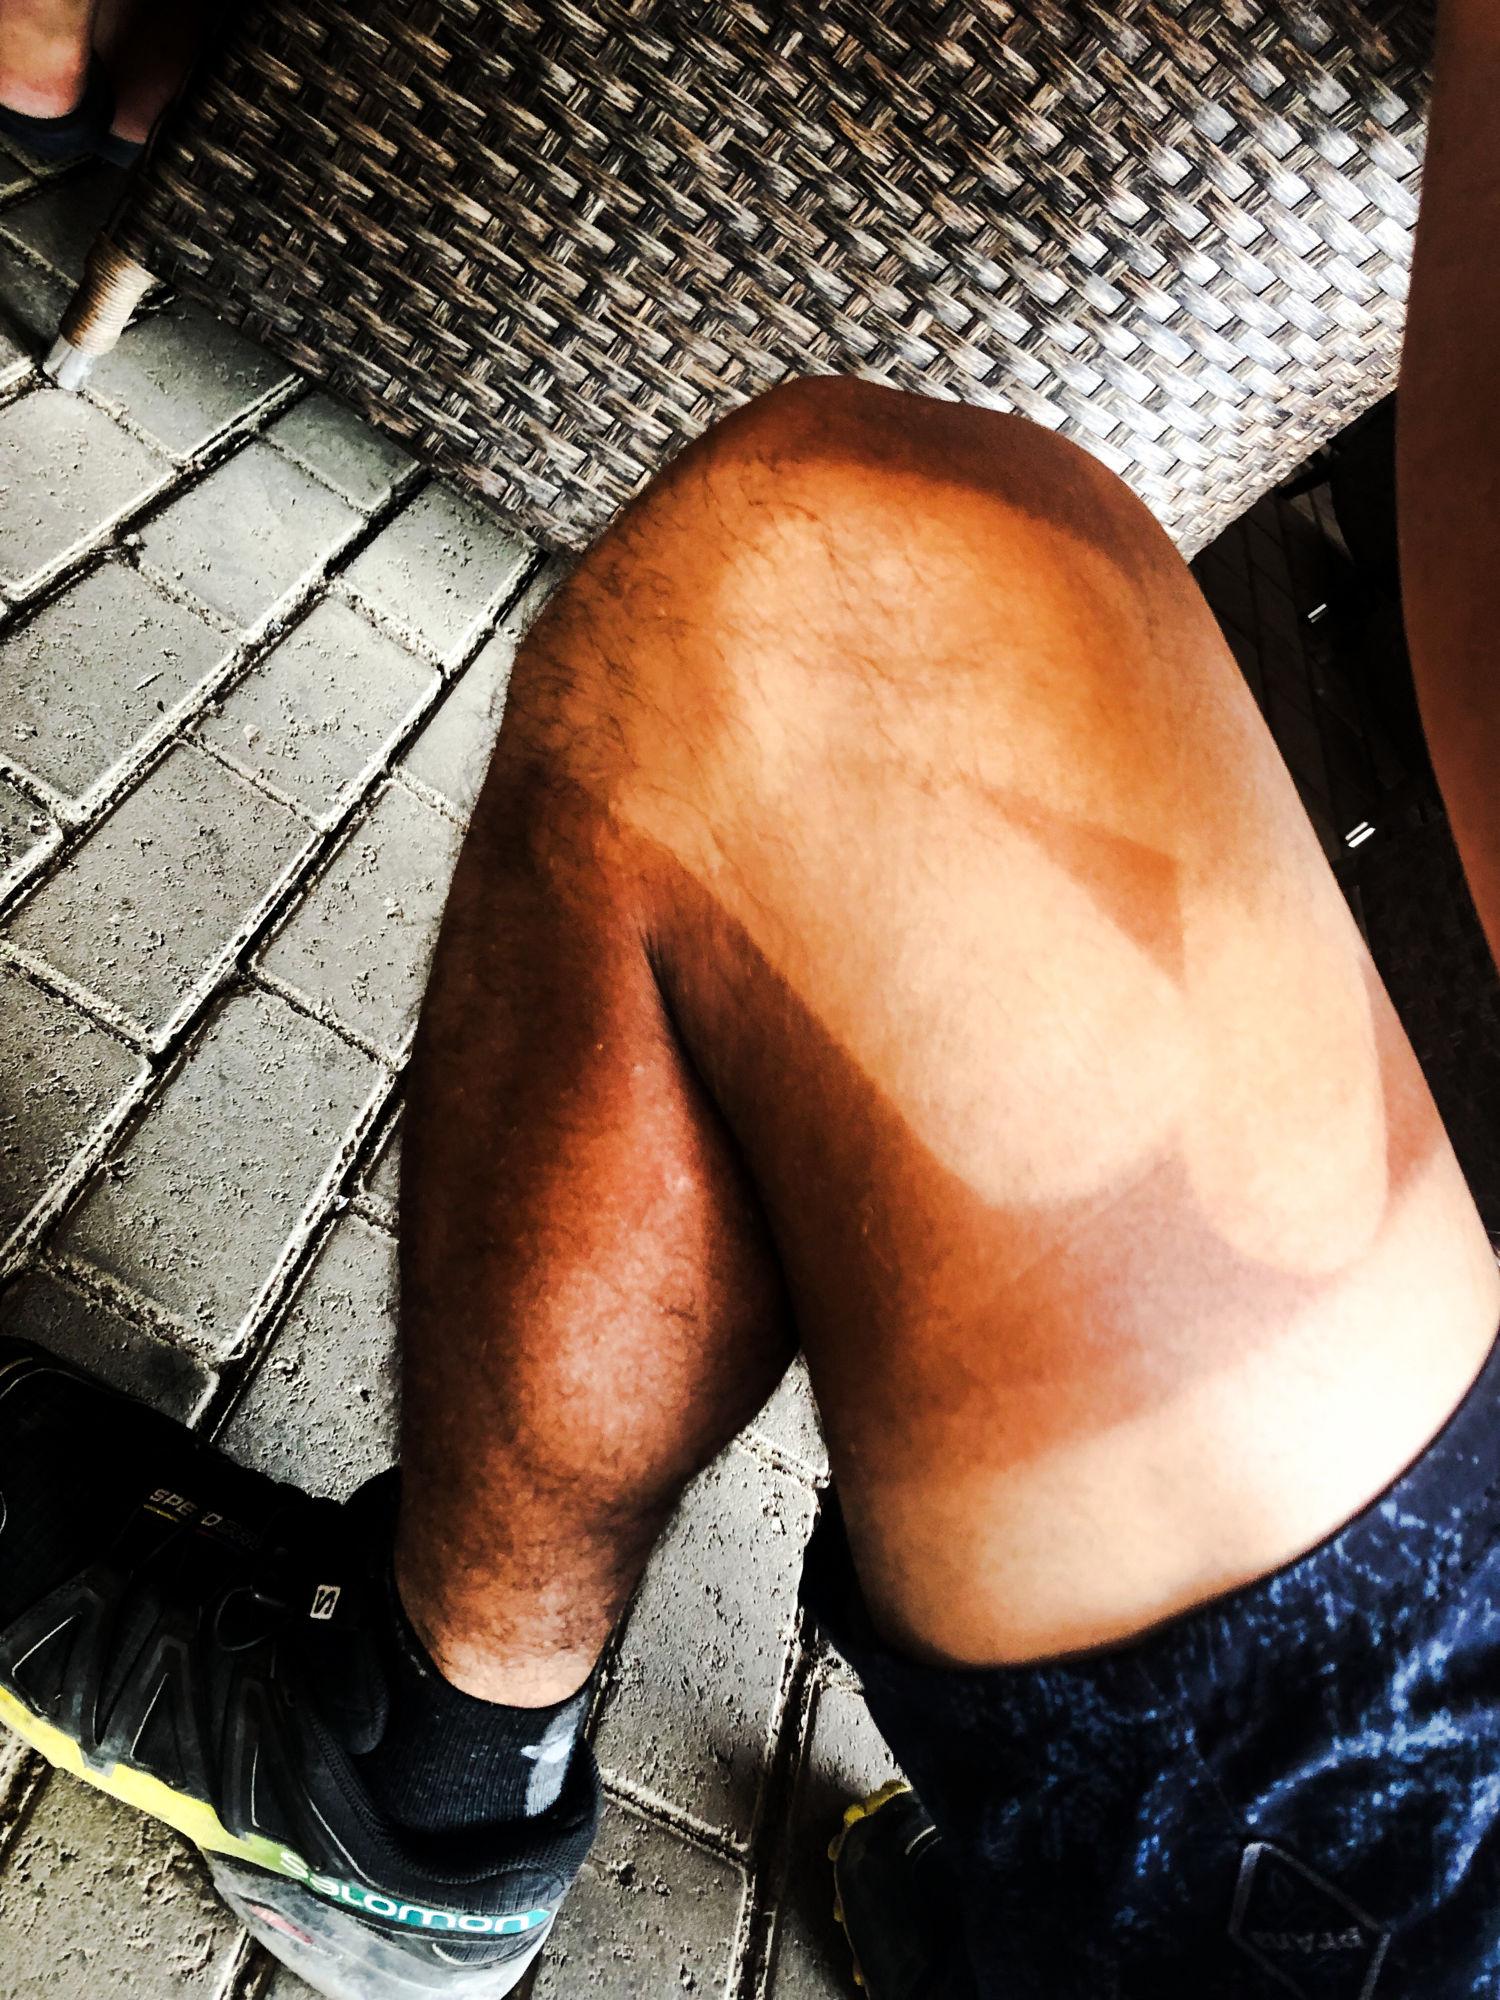 Taped knees